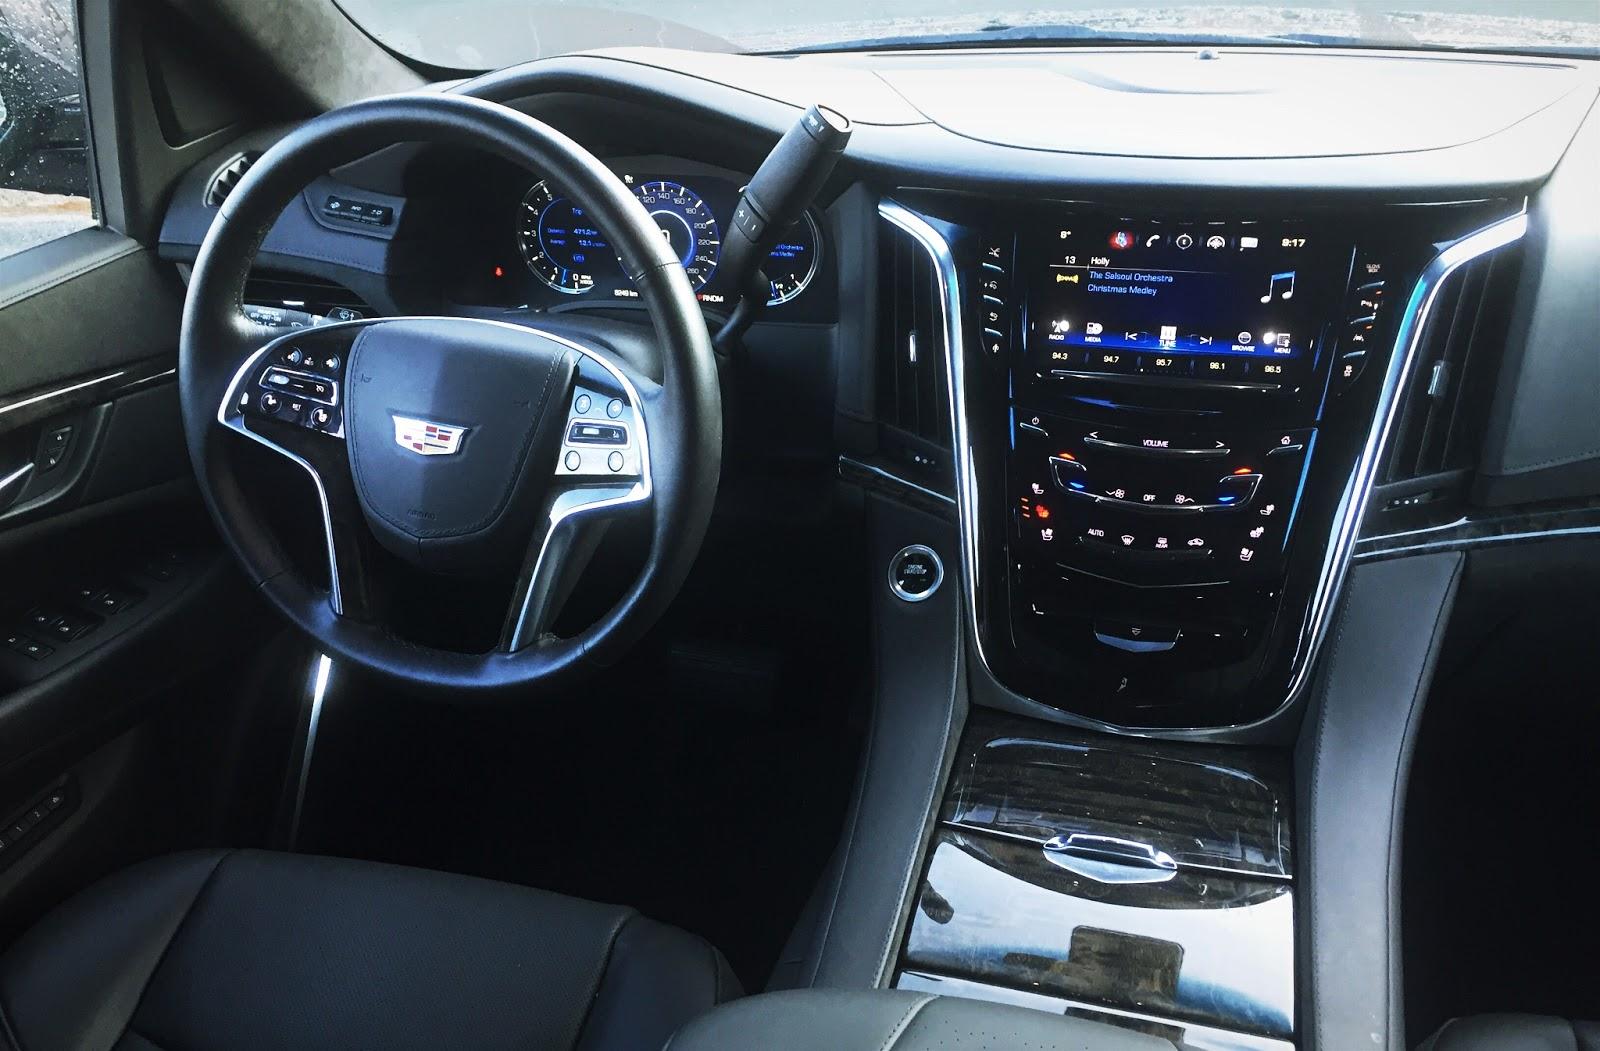 2016 Cadillac Escalade Review Detroit S Defining Luxury Vehicle Gcbc